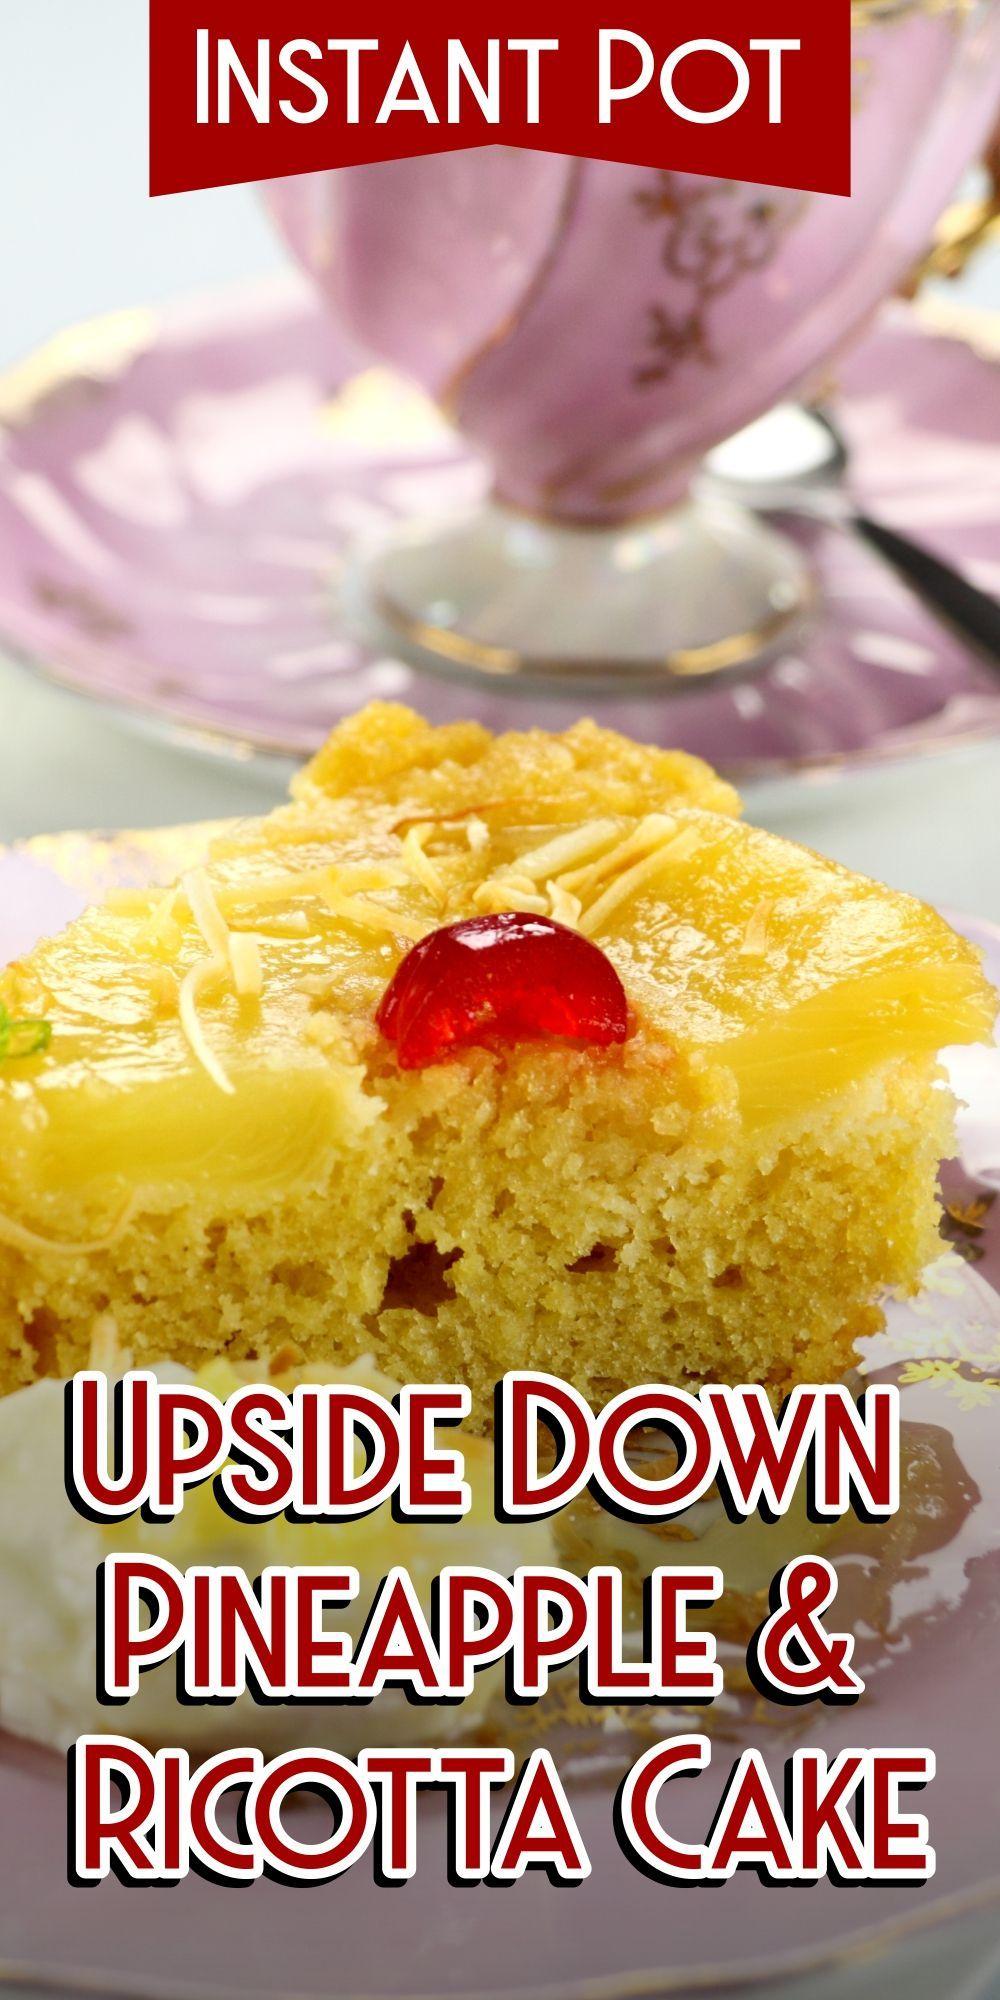 Pineapple Upside Down Cake Recipe Instant Pot